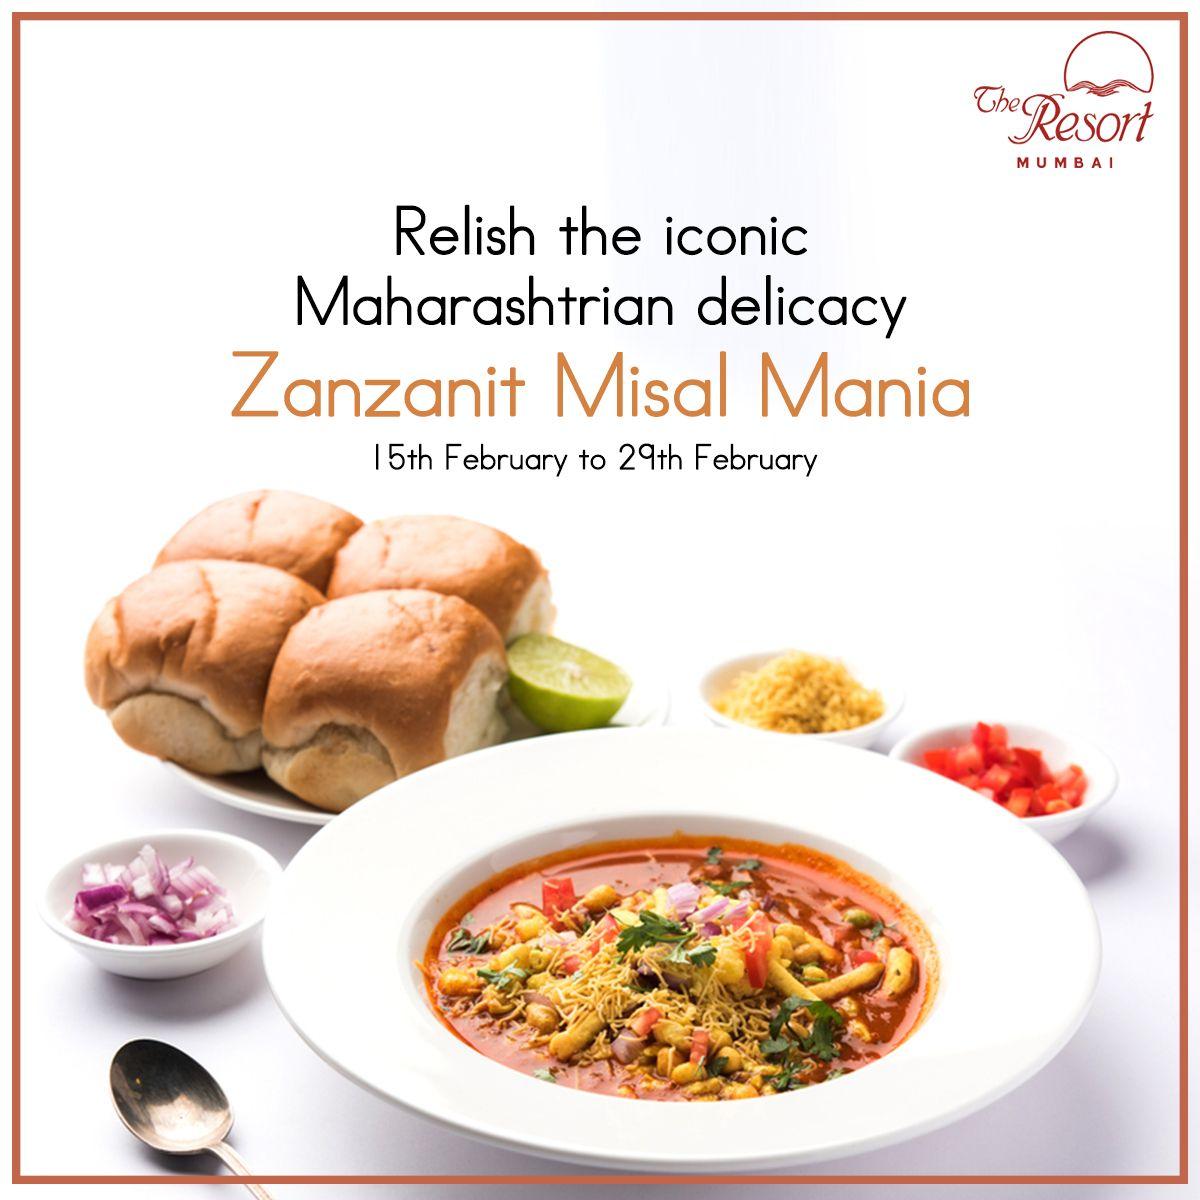 Do join us for a lip-smacking experience from 15th February to 29th February exclusively at The Resort.  Visit us at www.theresortmumbai.com  #TheResort #BeachResort #MumbaiResort #LuxuryResorts #FoodResort #Zanzanit #MisalPav #Misal #ZanzanitMisalMania #Spicy #MaharashtrianDelicacy #MaharashtrianRecipe #Maharashtrafood #FoodLover #MisalLover #Misalpavlover #MisalFest #MisalMania #MumbaiFoodie #Foodie #InstaFoodie #SpicyFoodLover